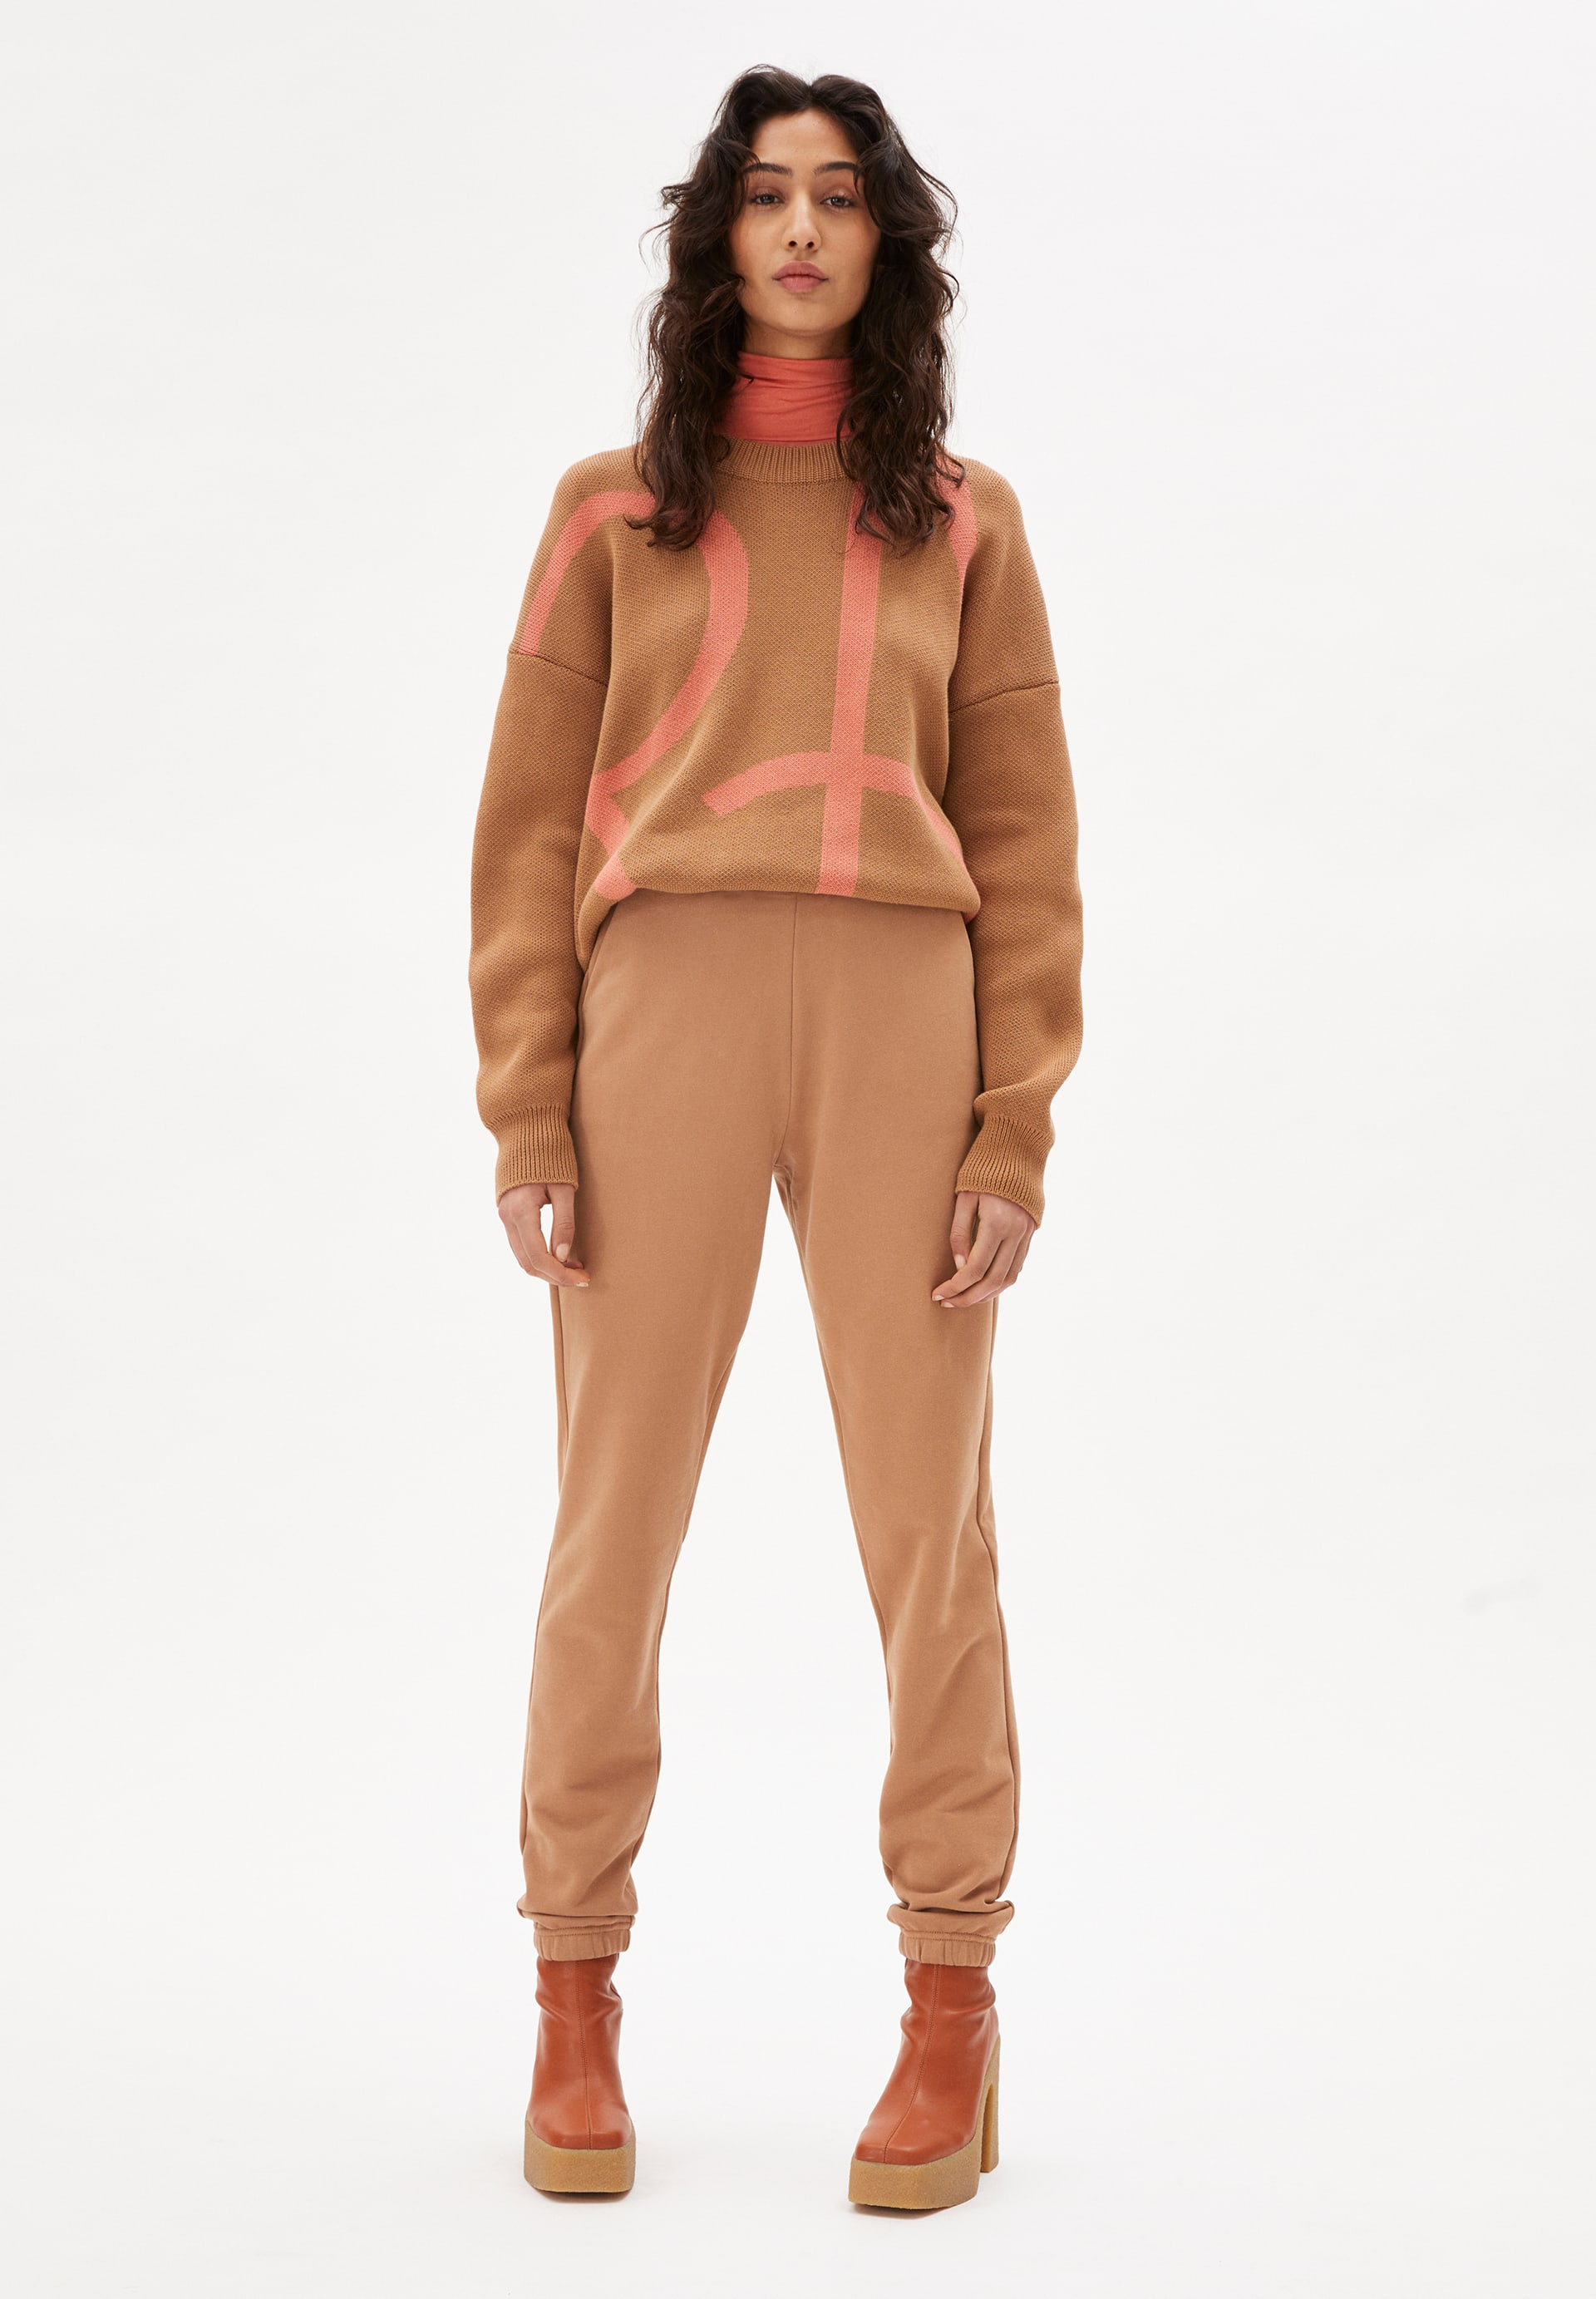 MANIAA LOGOMANIA Sweater made of Organic Cotton